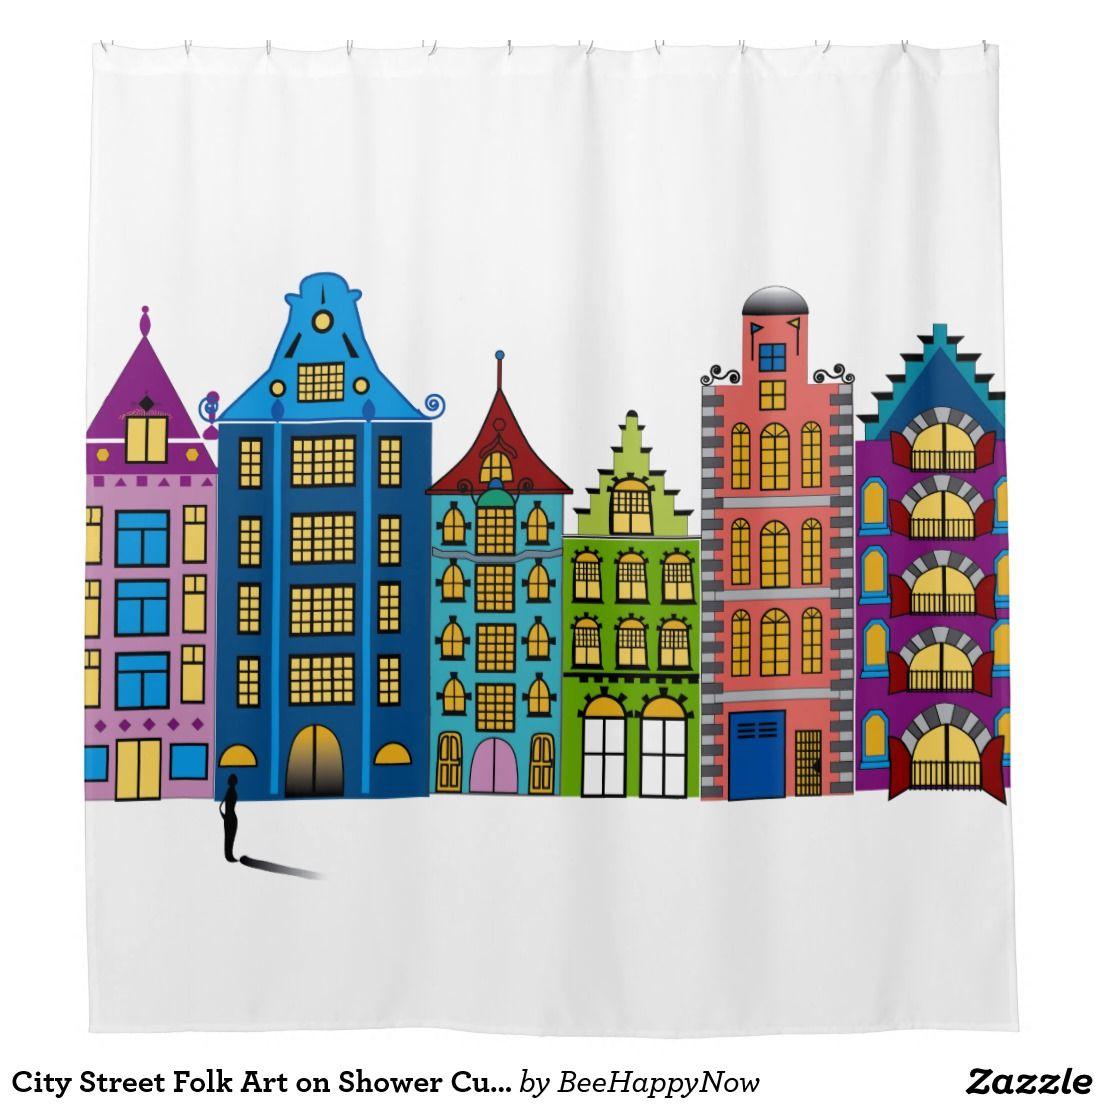 City Street Folk Art On Shower Curtain